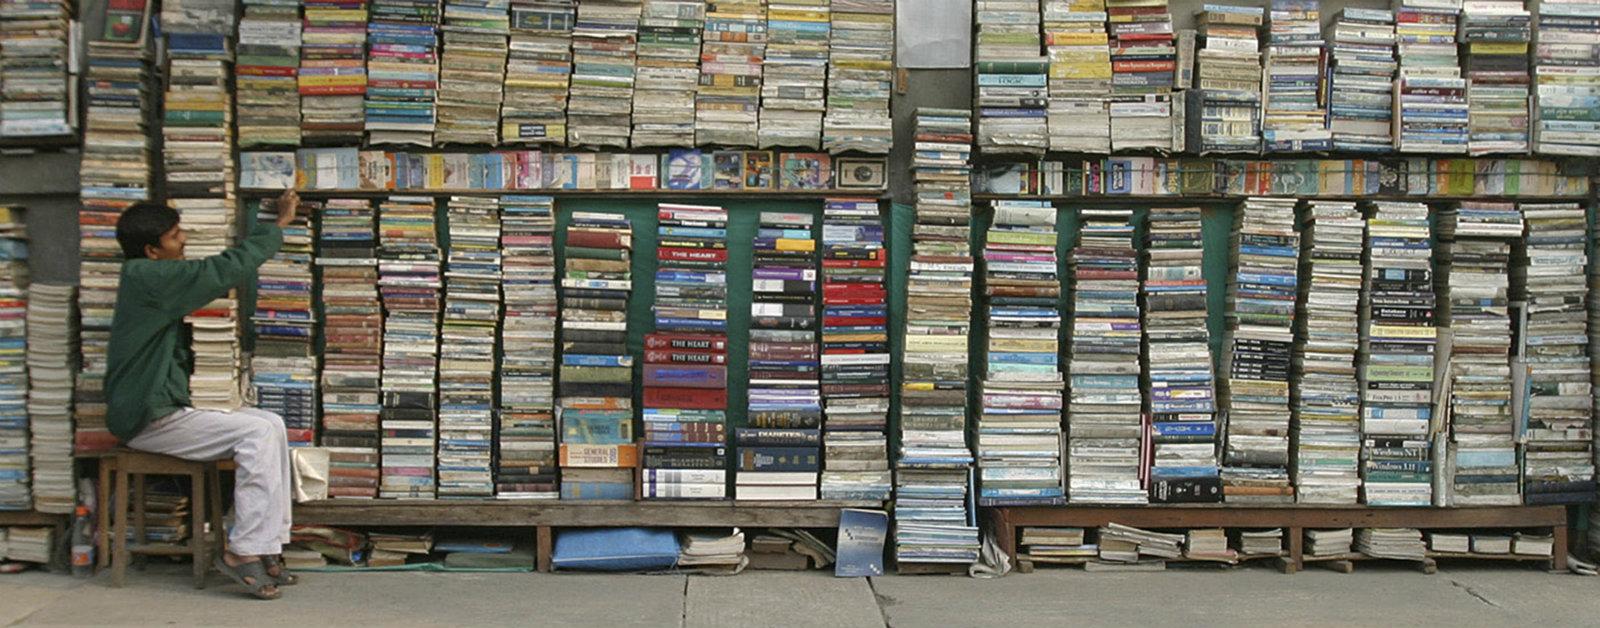 India-Business-Books